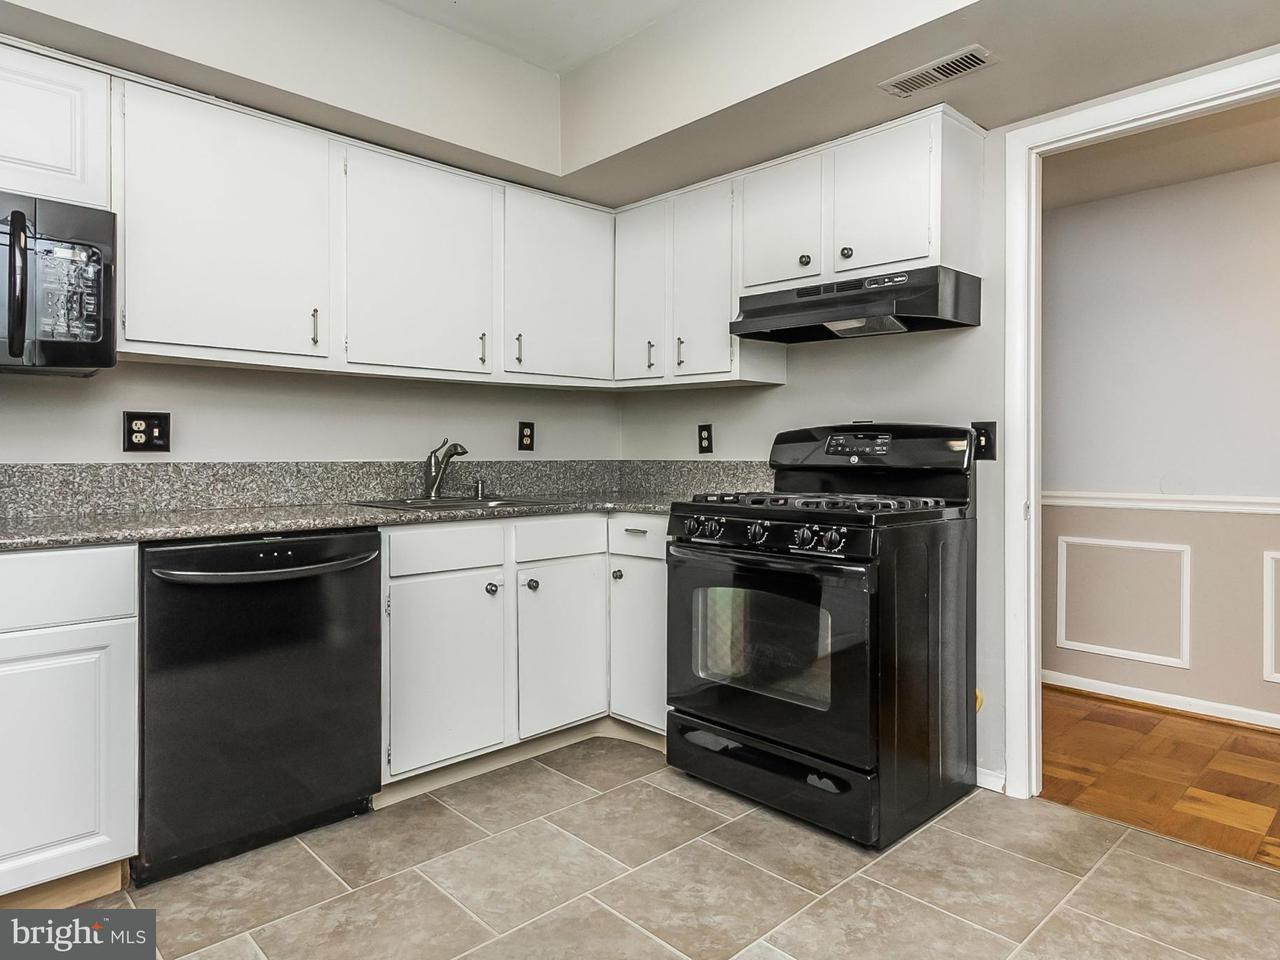 Condominium for Rent at 108c Cross Keys Rd #c Baltimore, Maryland 21210 United States